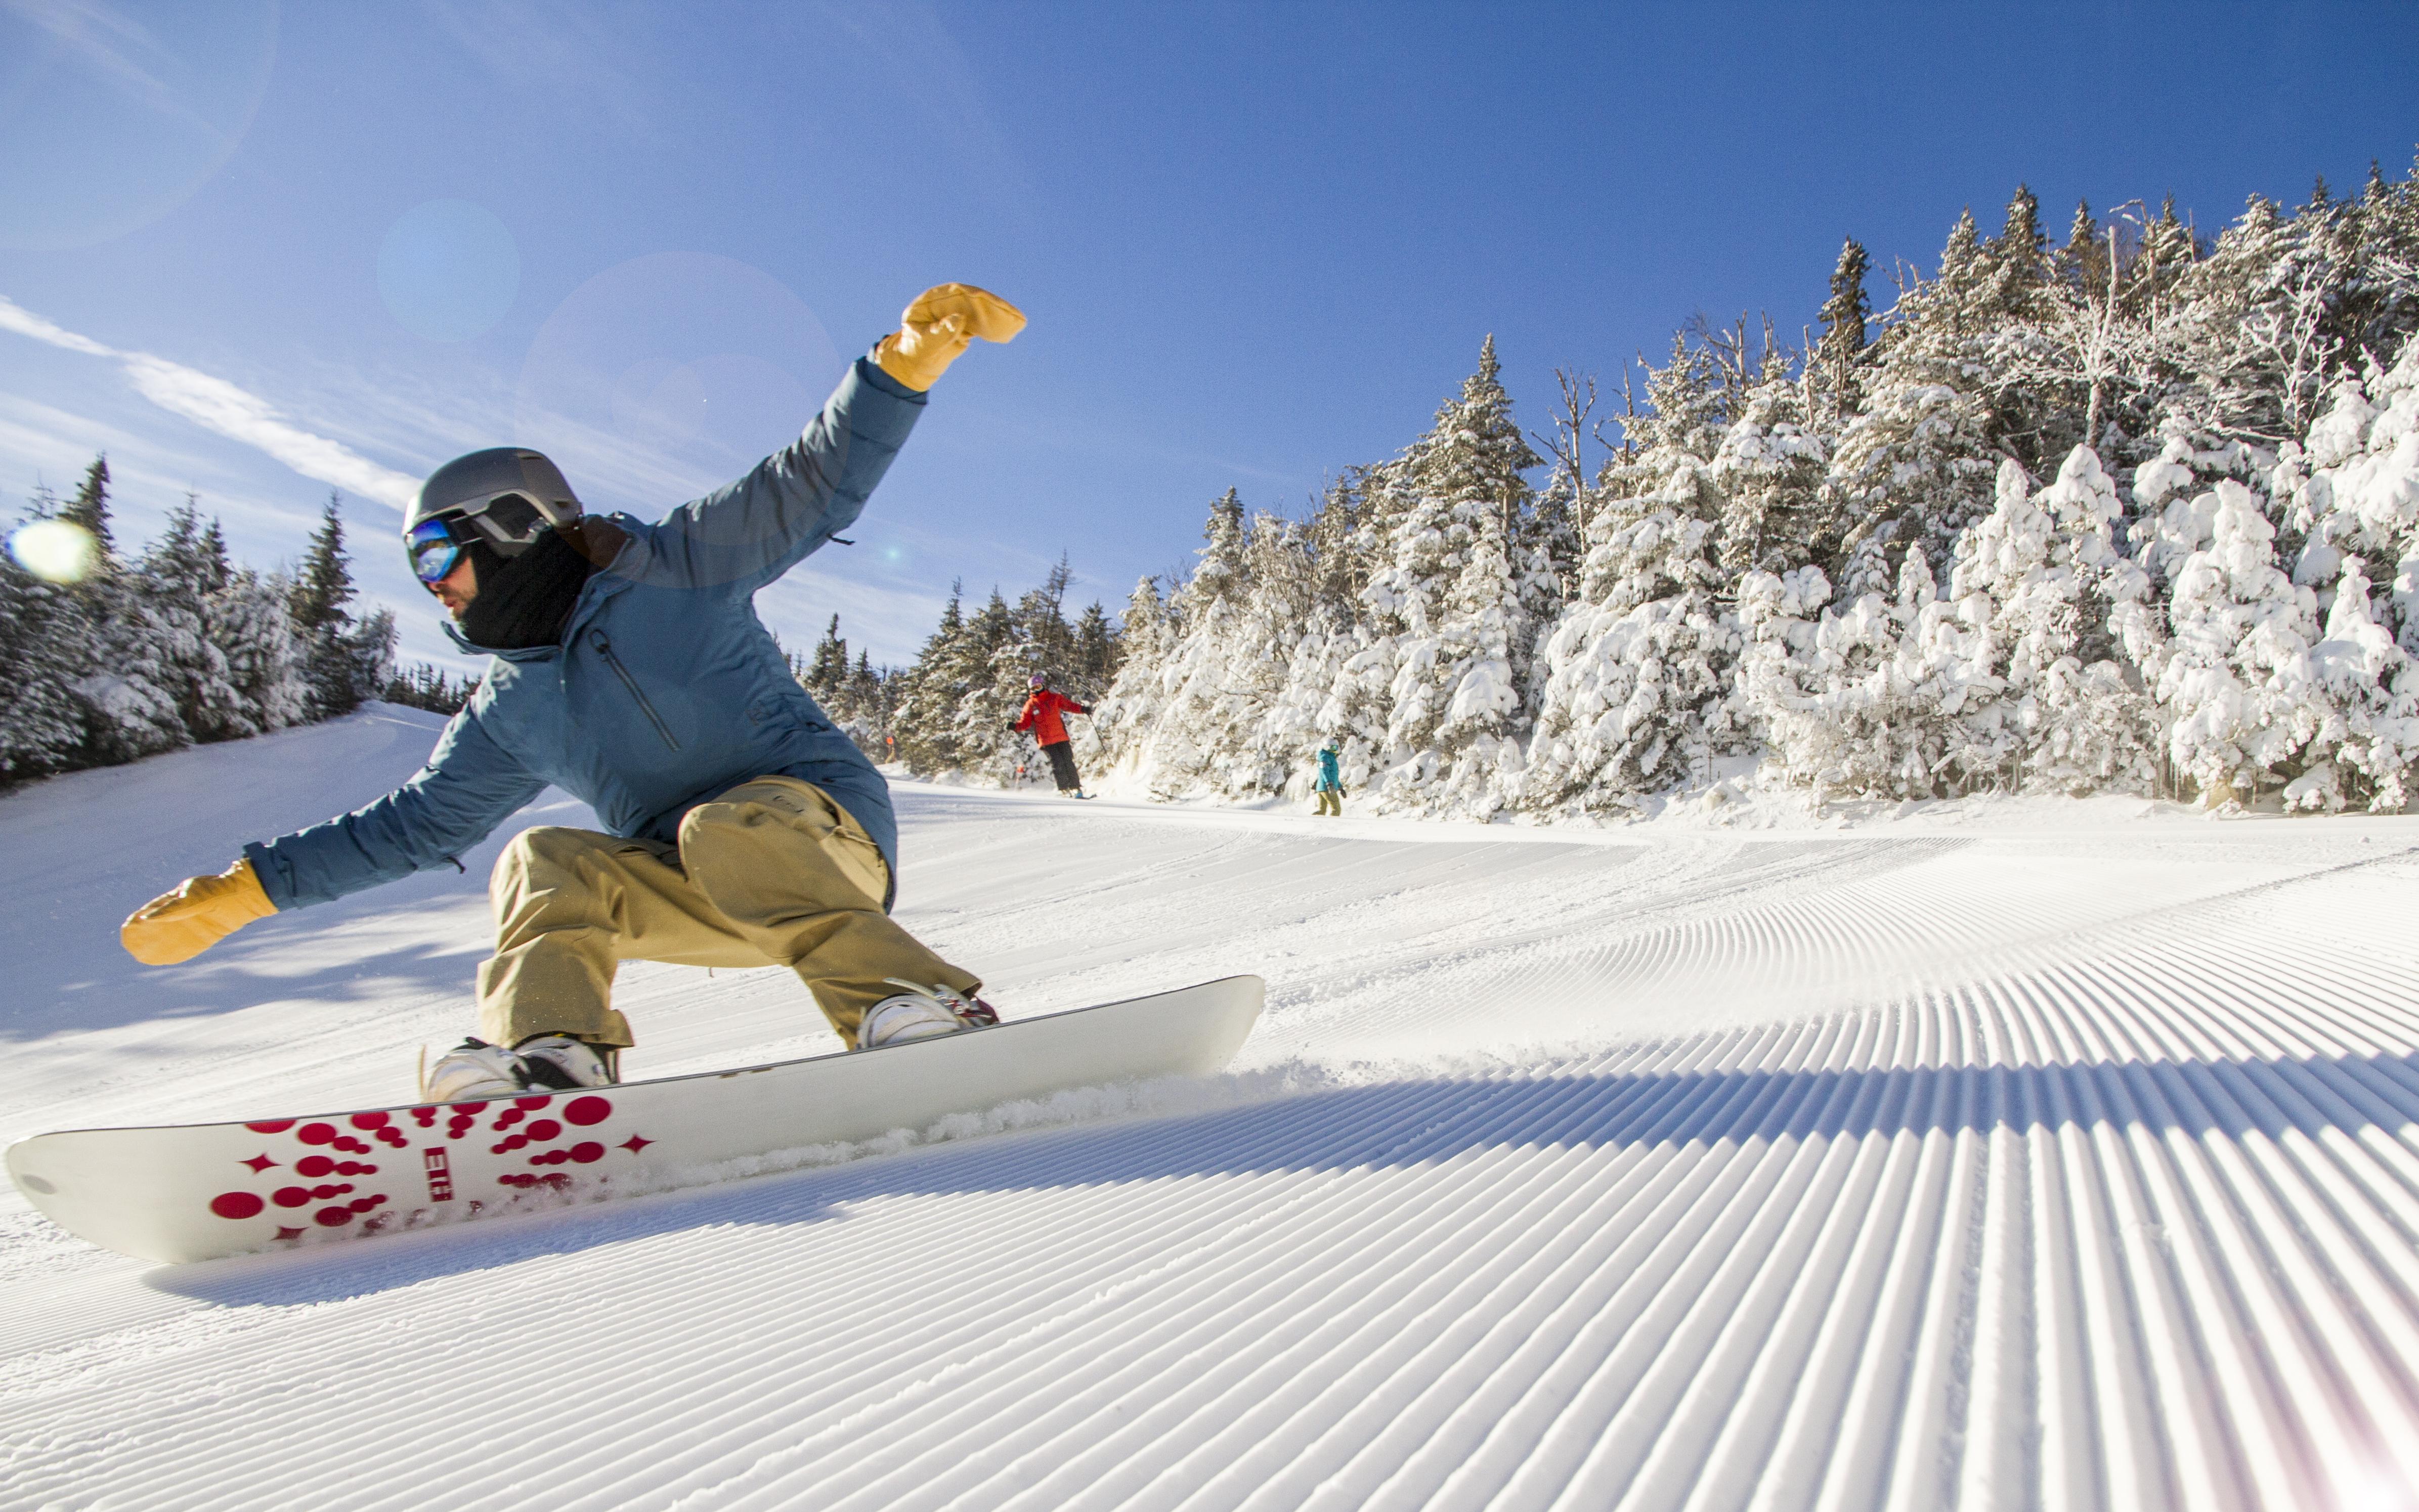 snowboarding & skiing in new york | find ski resorts & lodging